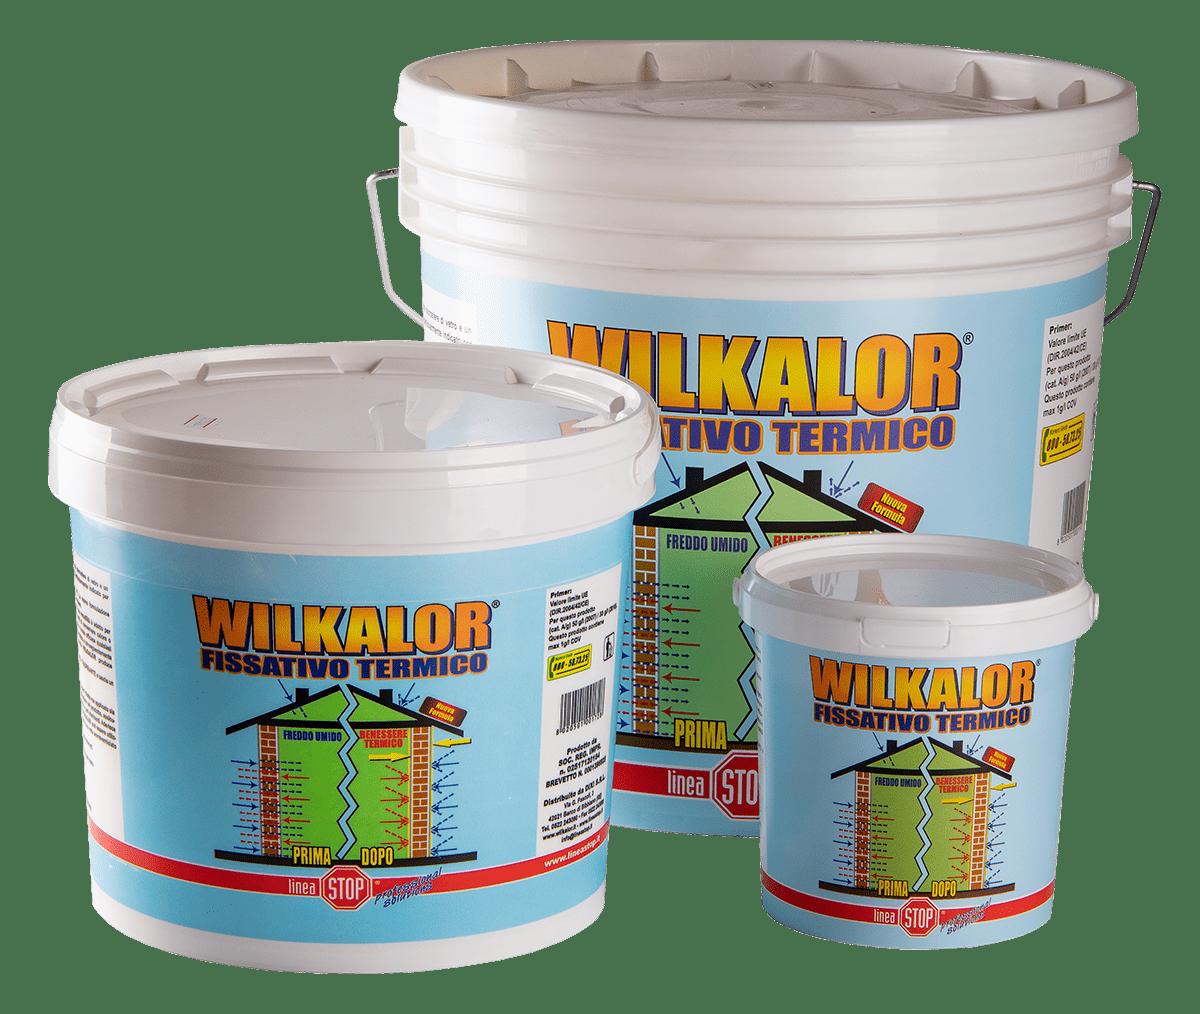 WILKALOR Image